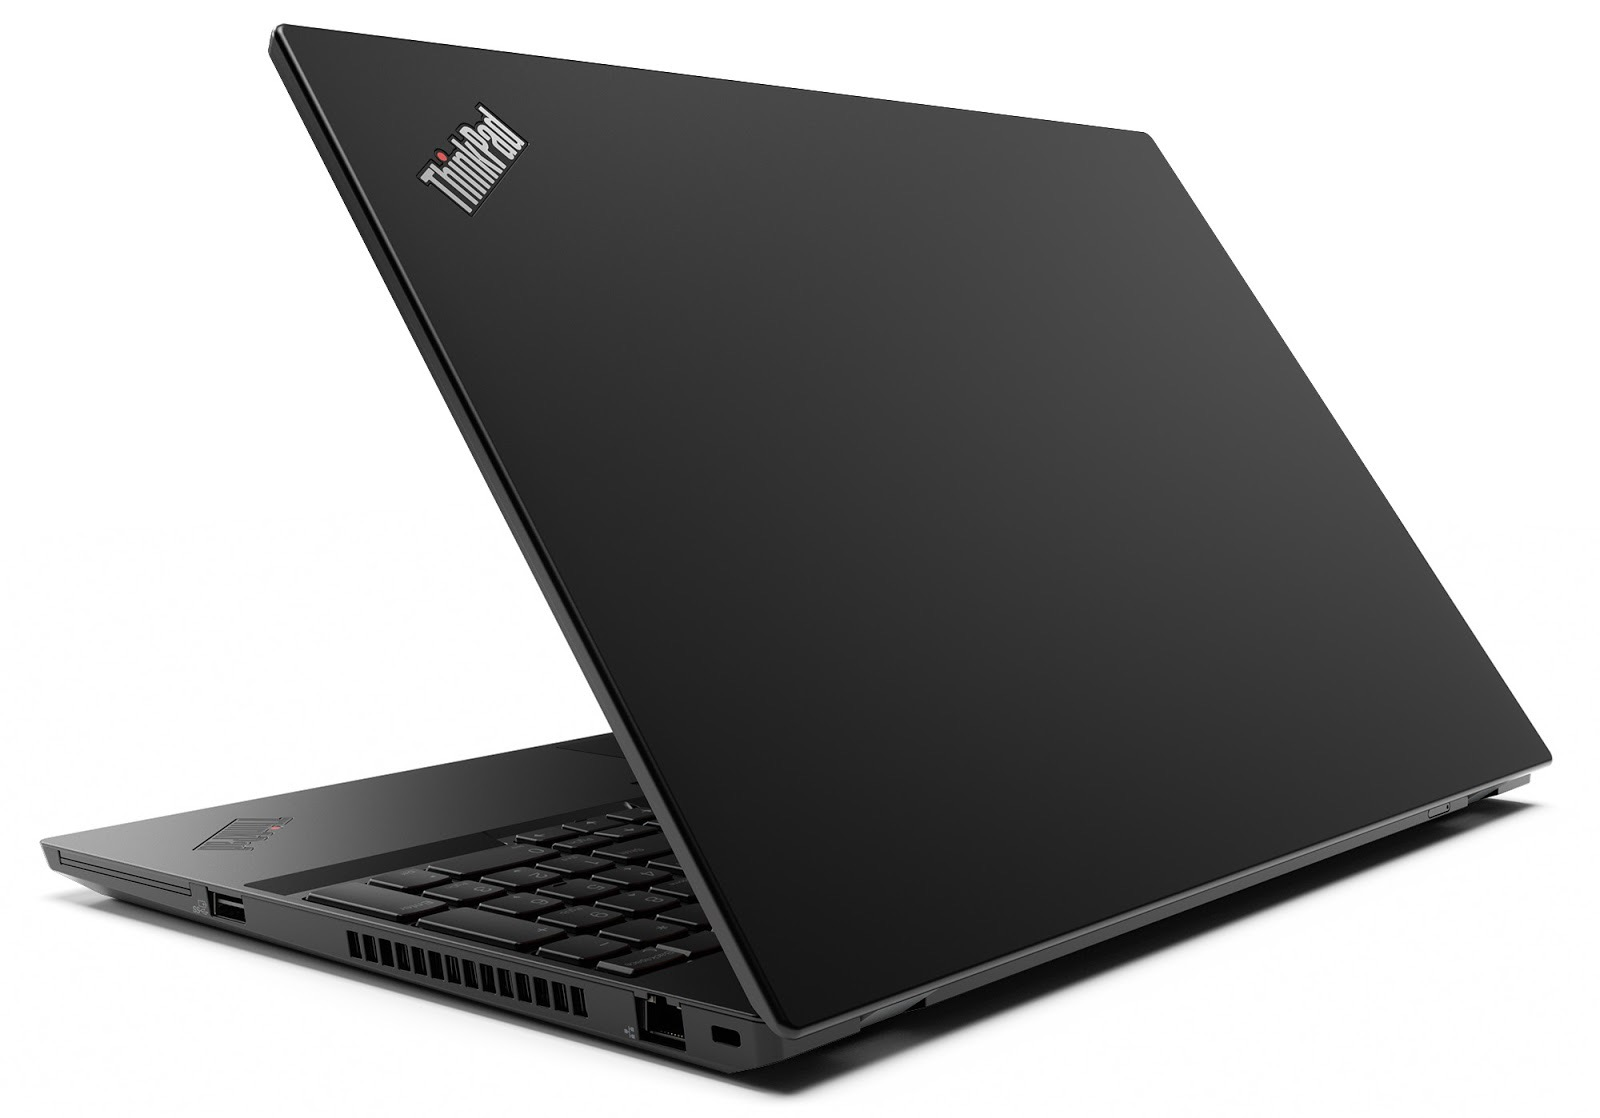 Фото 2. Ноутбук Lenovo ThinkPad T15 Gen 1 Black (20S6000TRT)